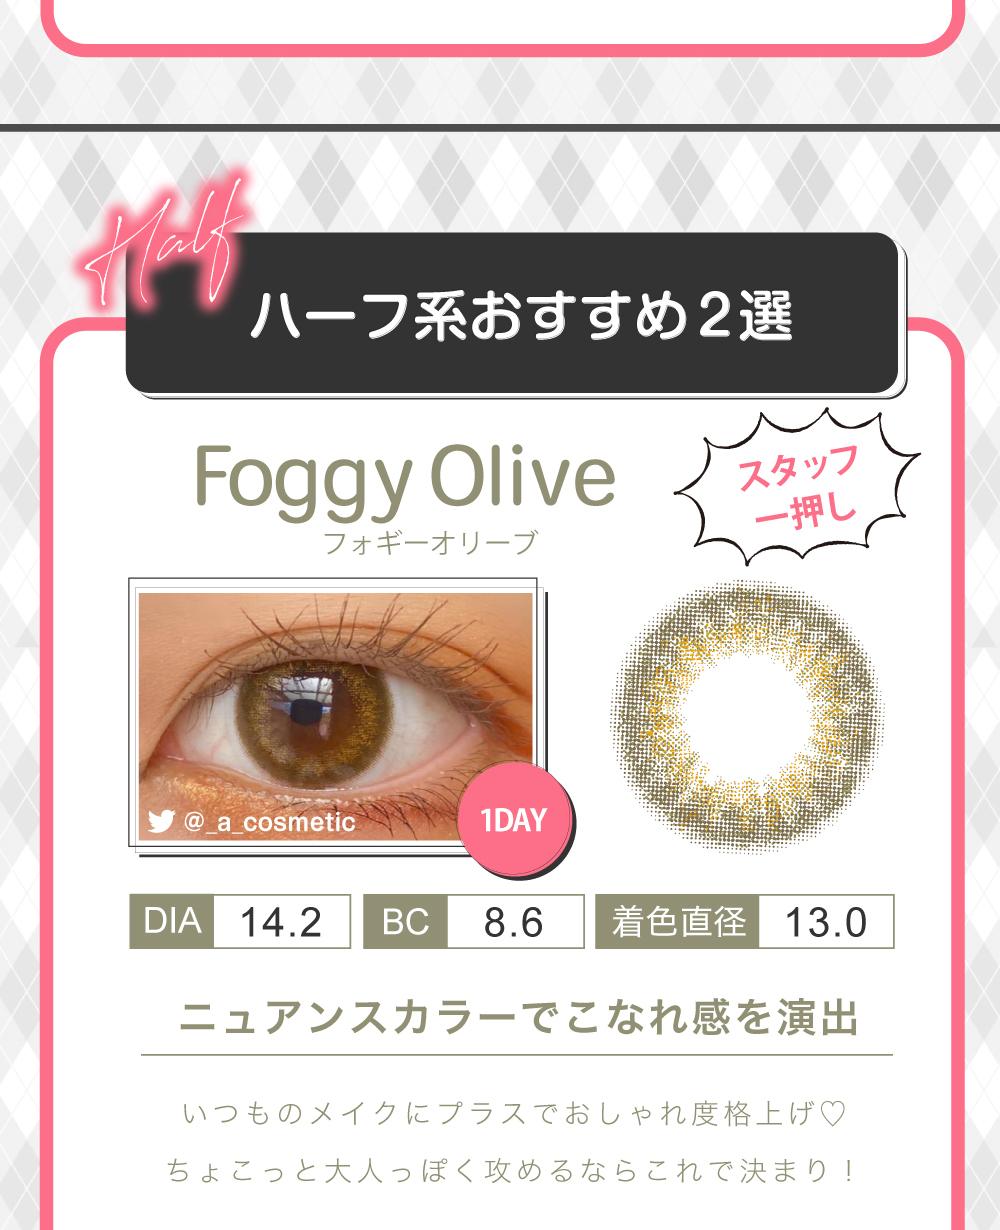 Foggy Olive 紹介